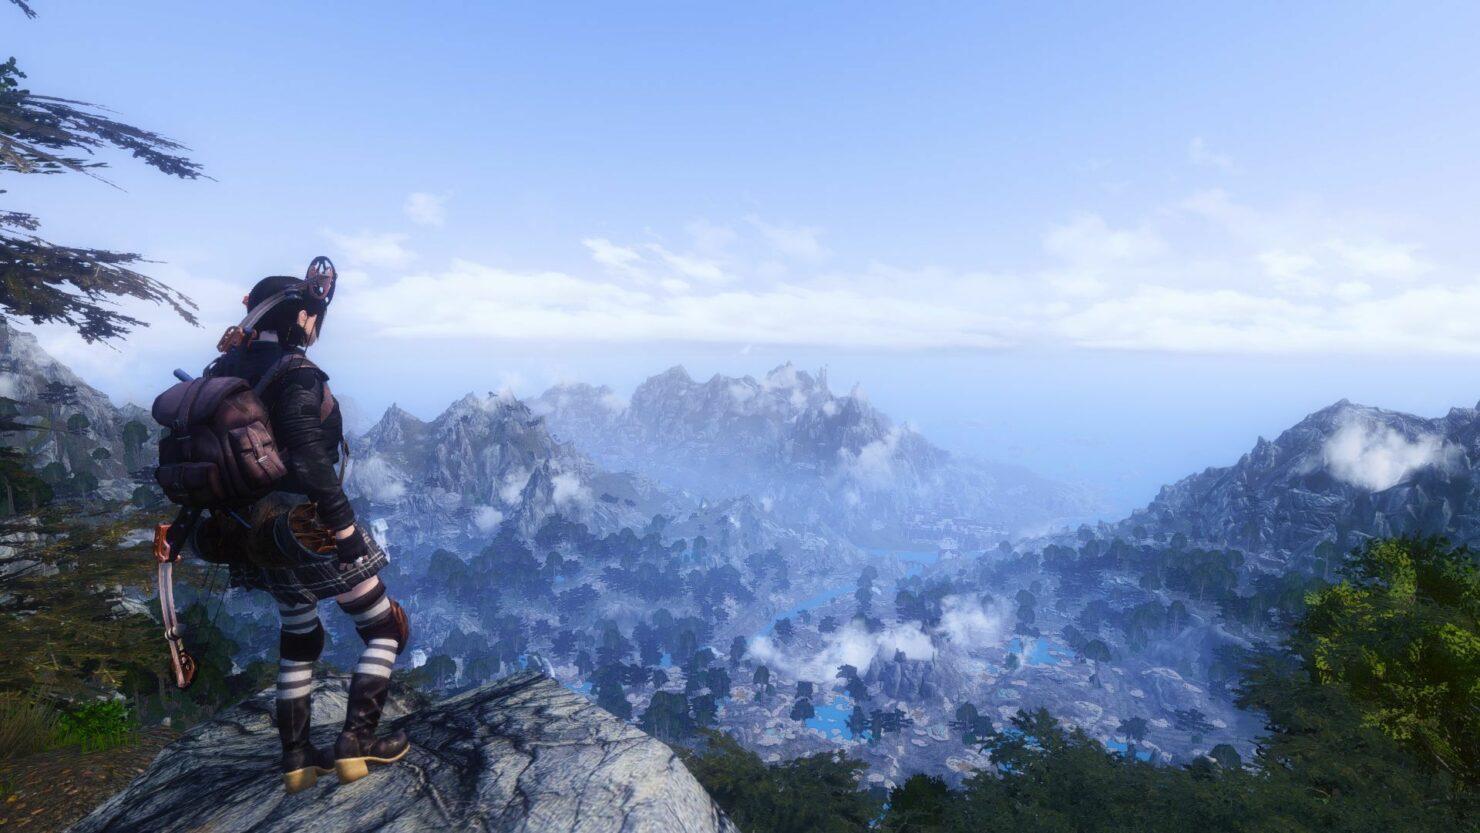 elder-scrolls-v-skyrim-legendary-edition-project-rainforest-mod-update-4